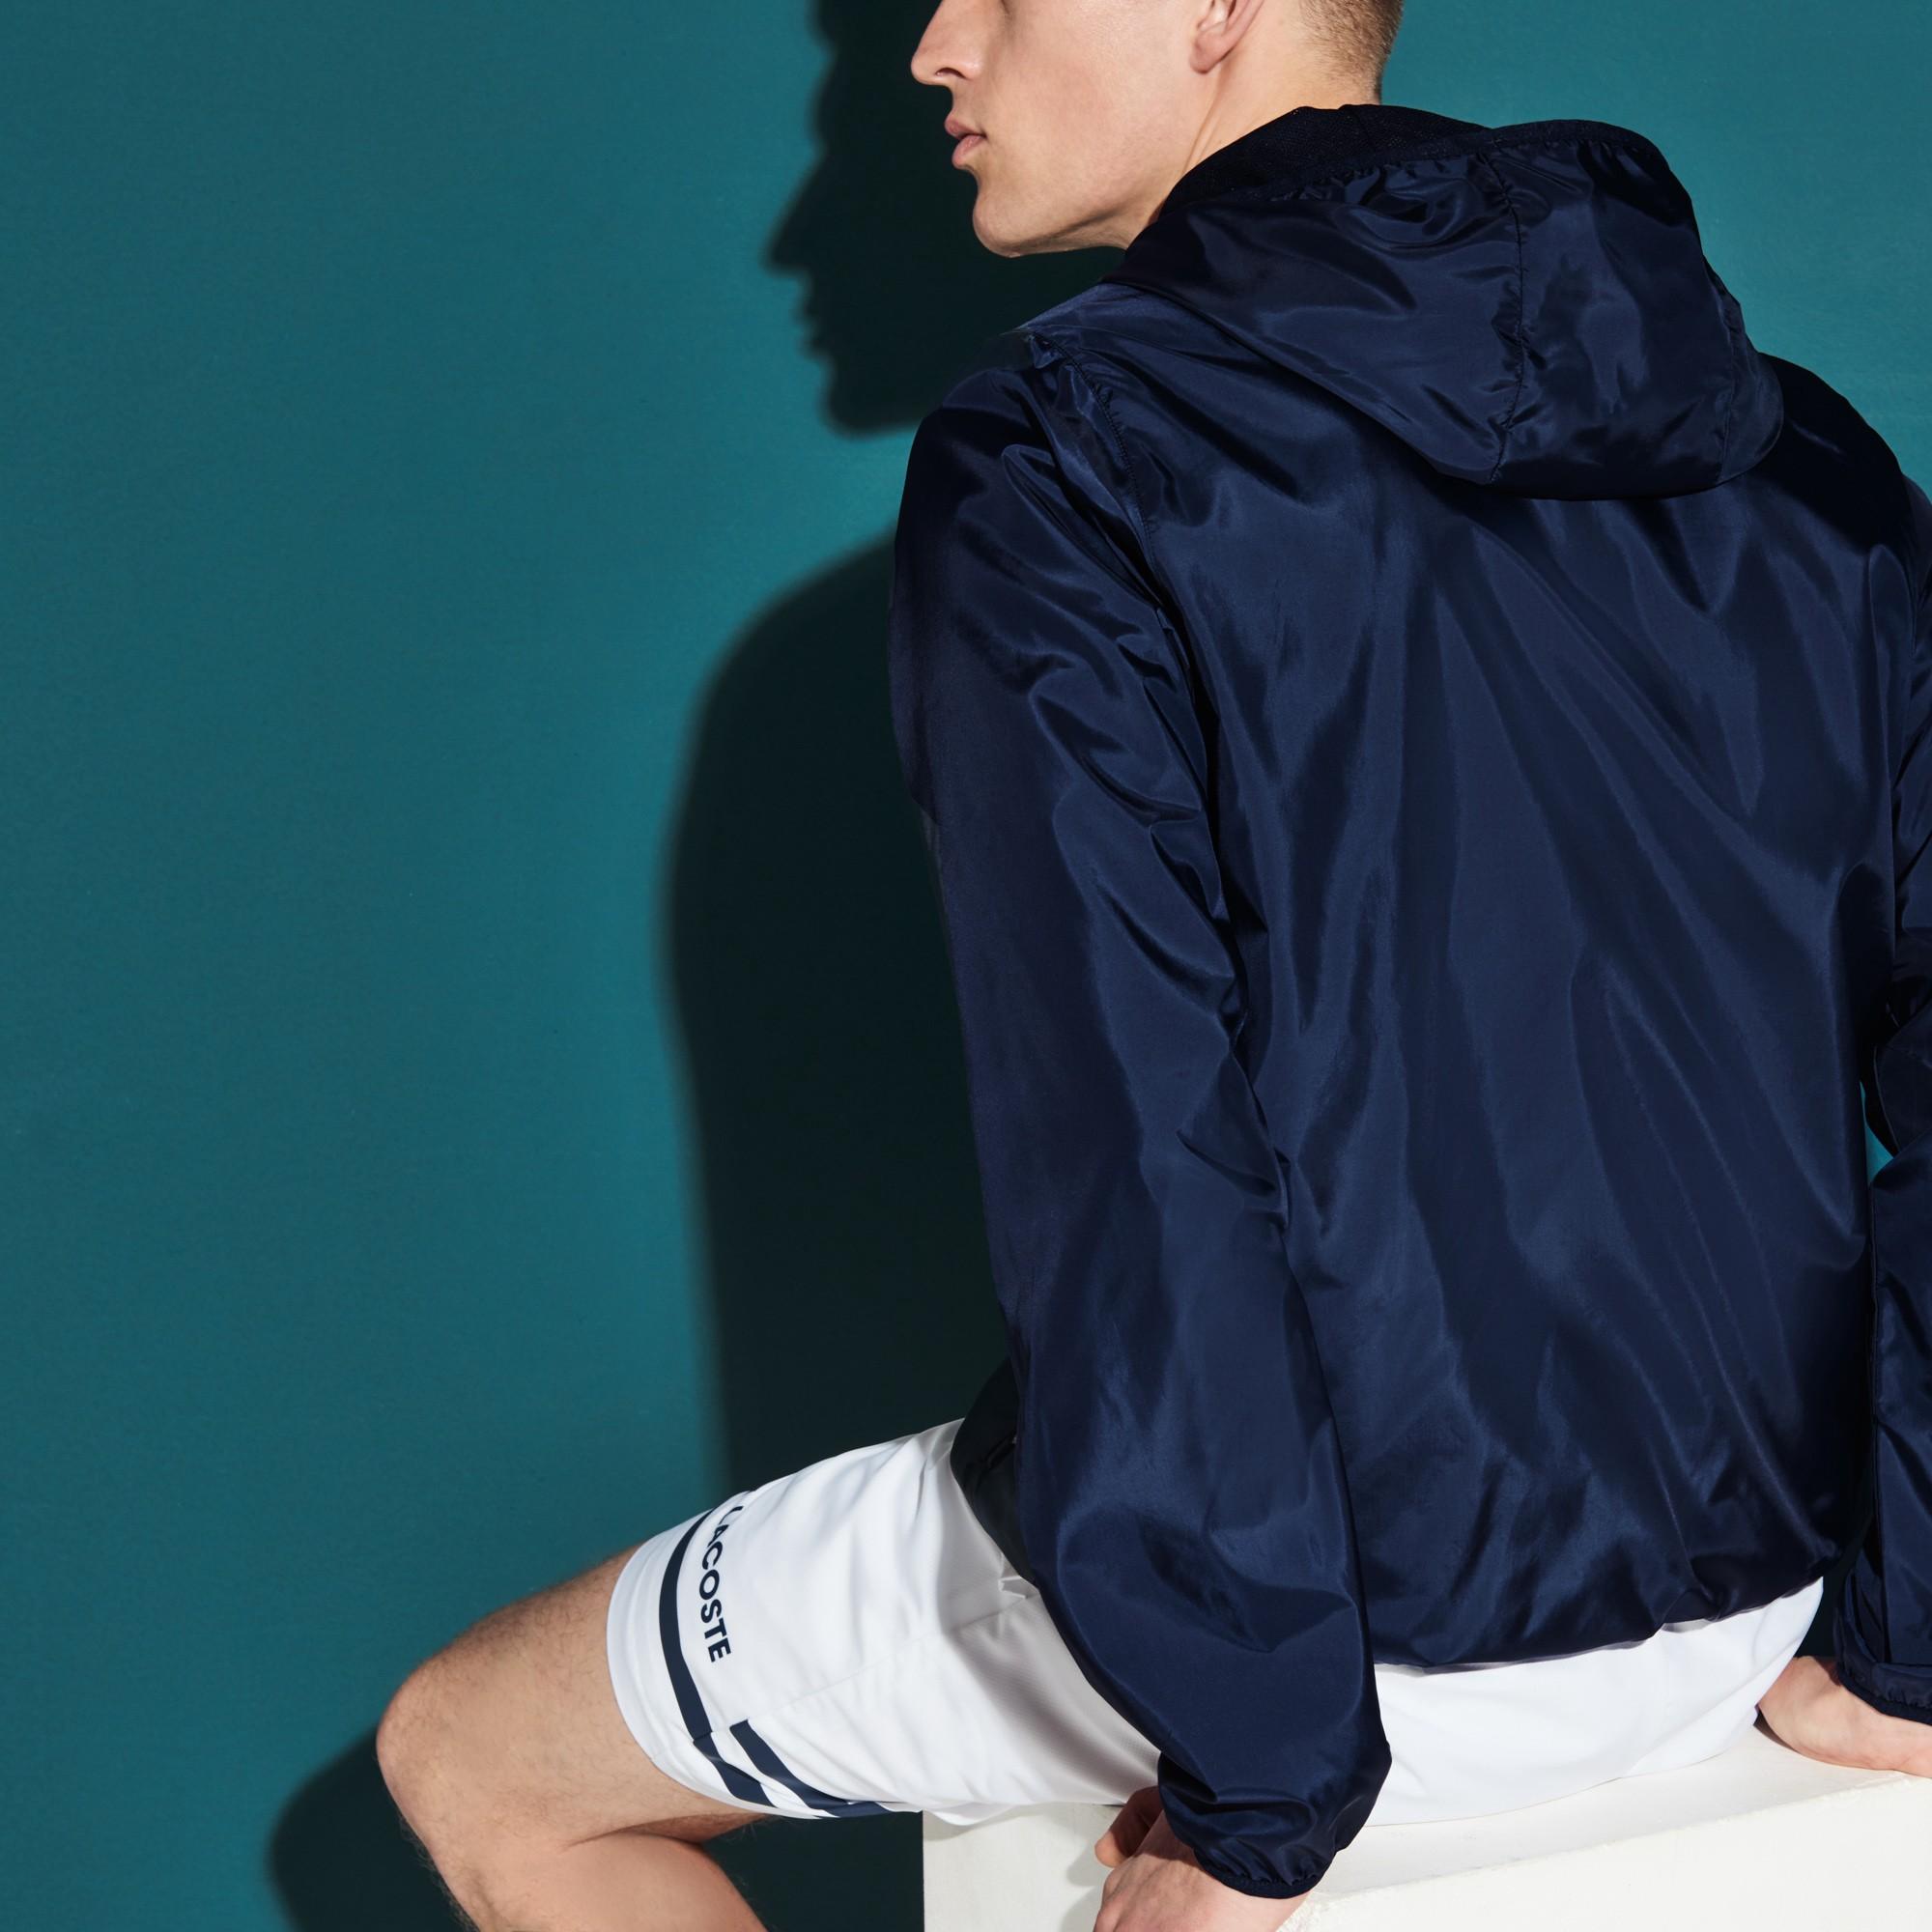 552c2d4f6 Lacoste Men s Sport Water-Resistant Tennis Jacket - Black White Xxl Green